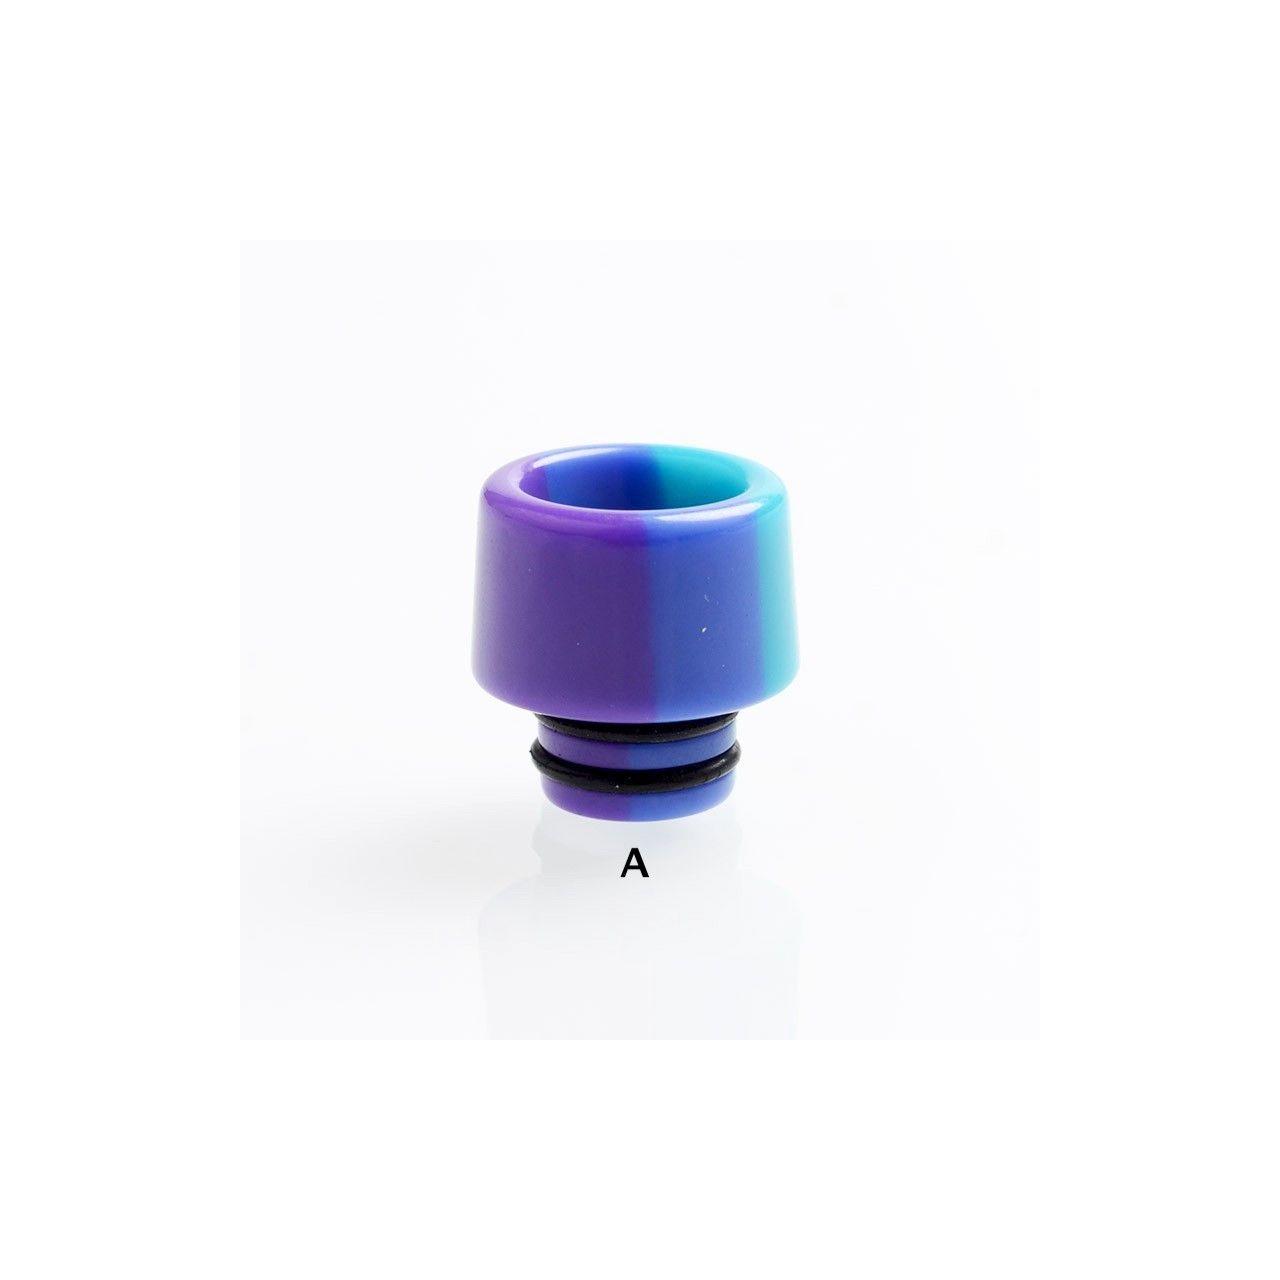 Drip Tip Aleader 510 (1Pç)